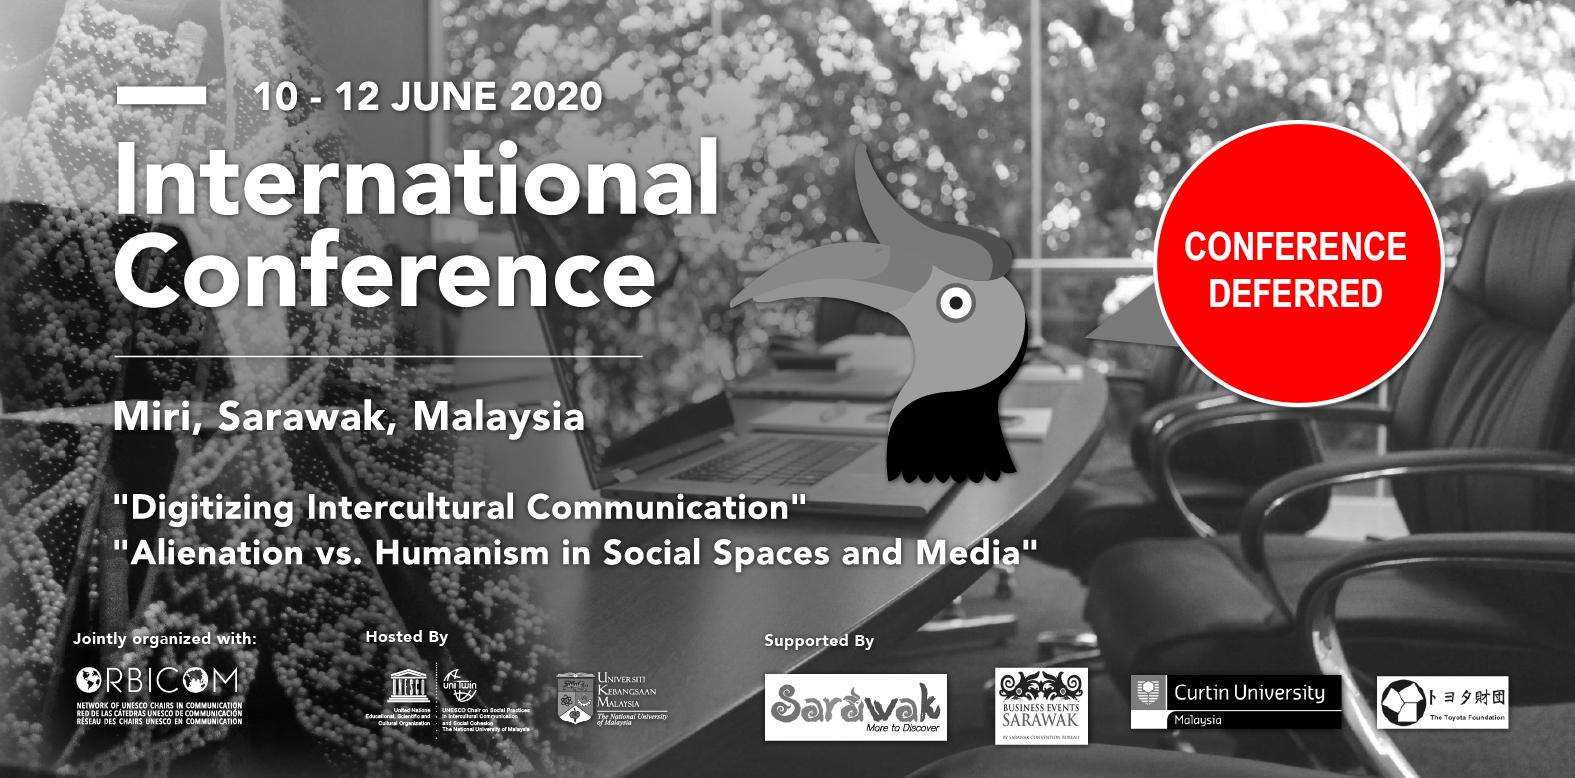 International Conference on Digitizing Intercultural Communication